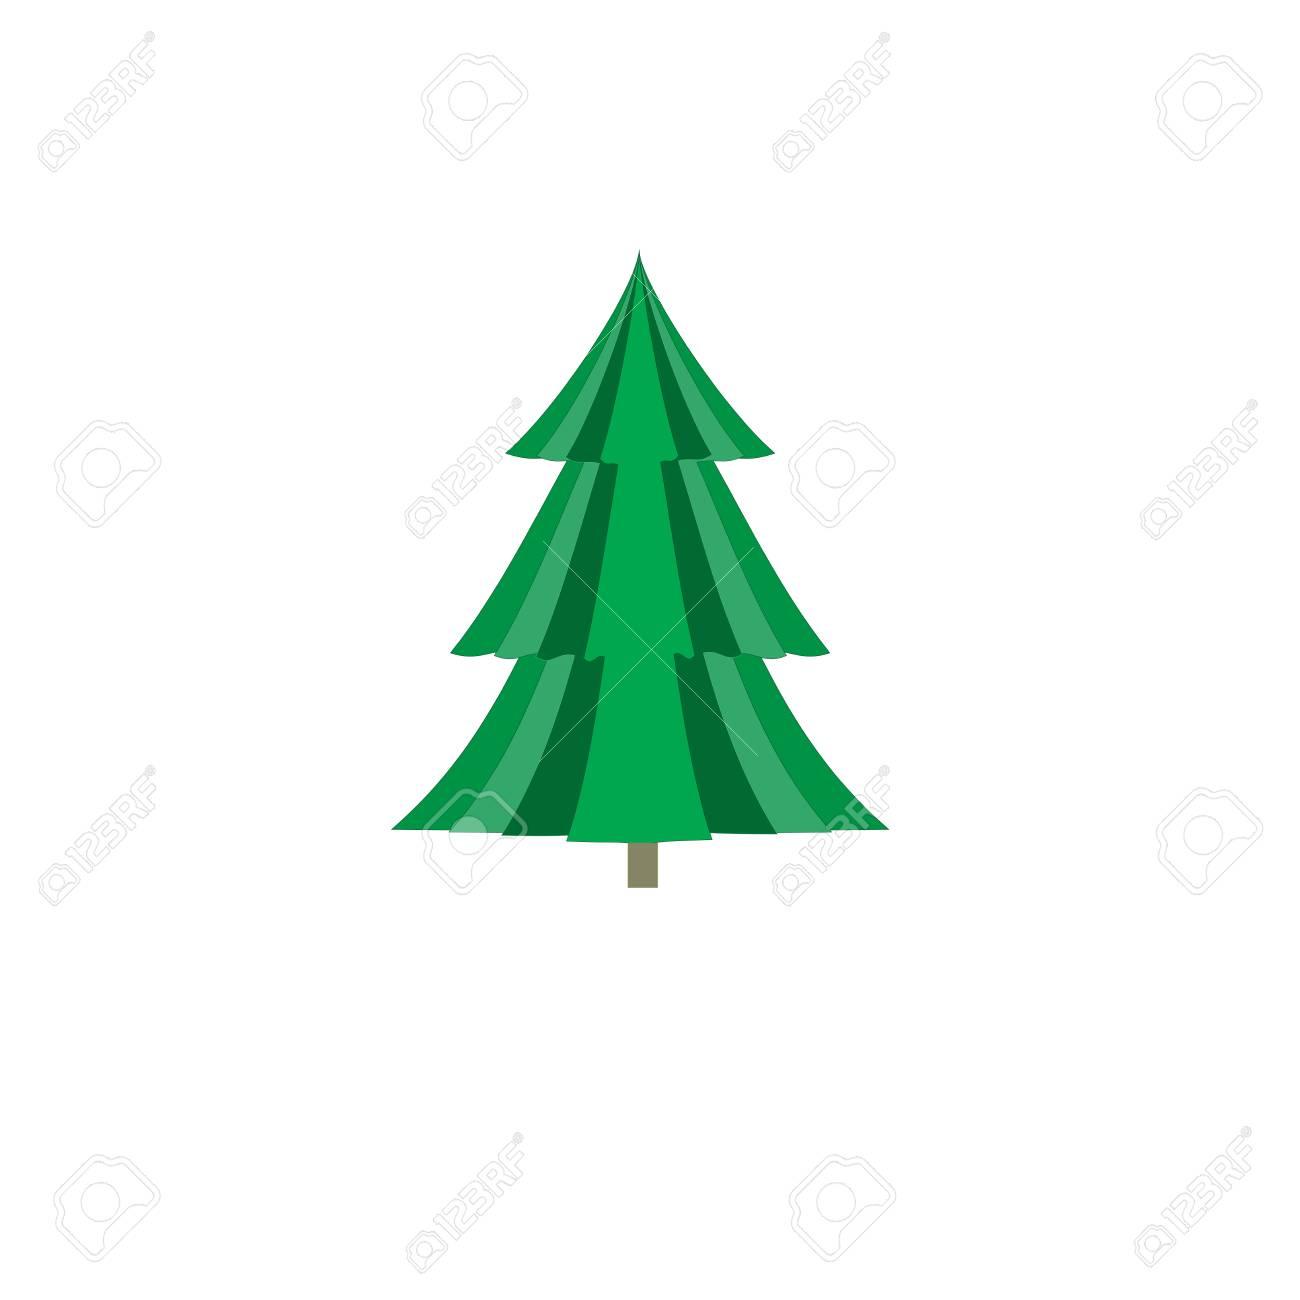 Simple Christmas Tree Original New Year Card Fashion Graphic